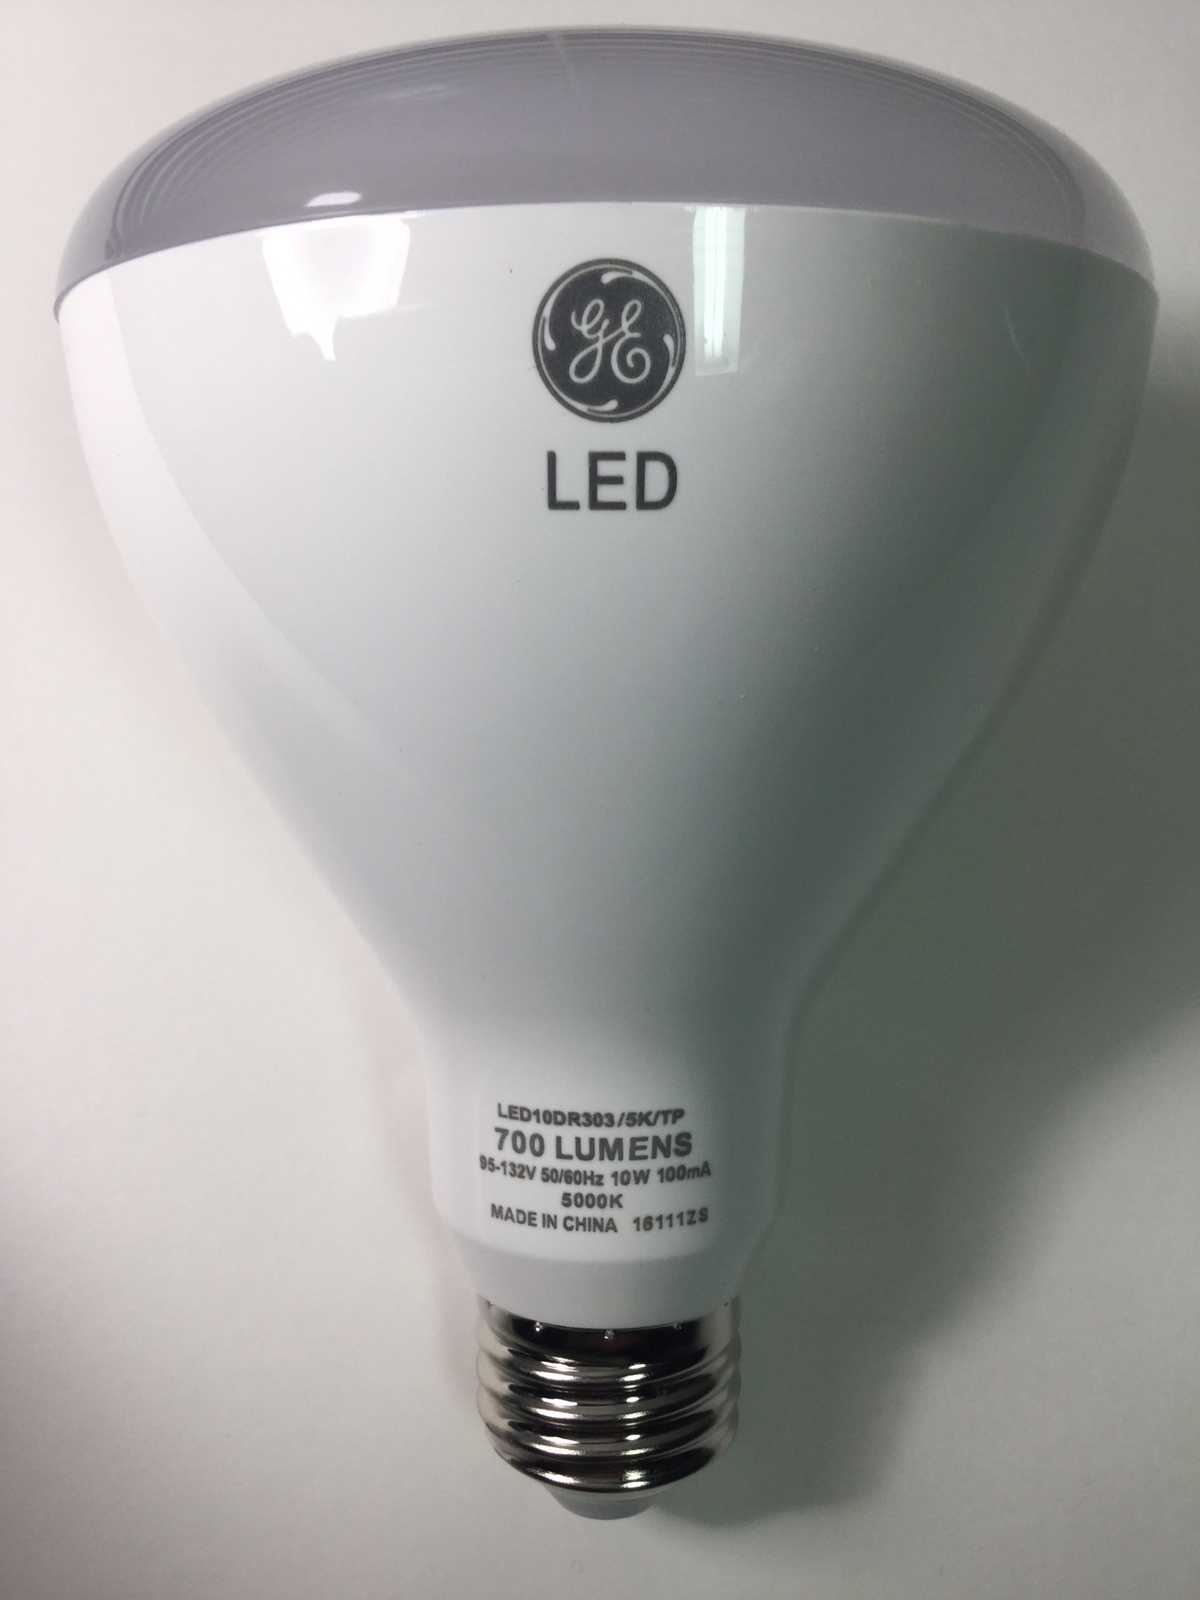 Led Daylight Bulb: 4 Bulbs GE LED Daylight 65W Equivalent Dimmable BR30 Flood